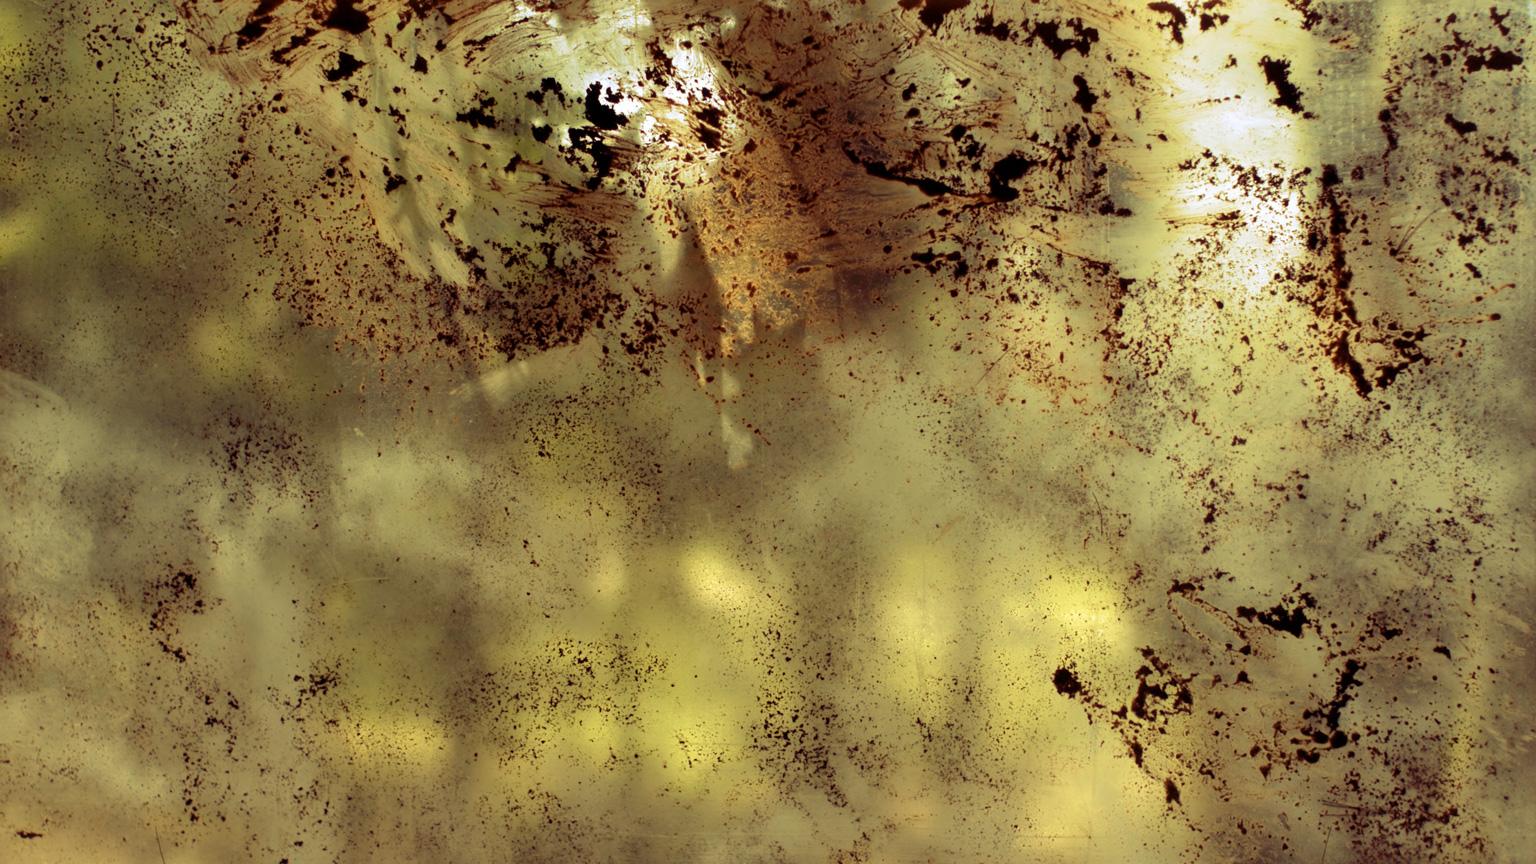 Conspiracy of Silence, Window 5 #592, 2009, C-Print